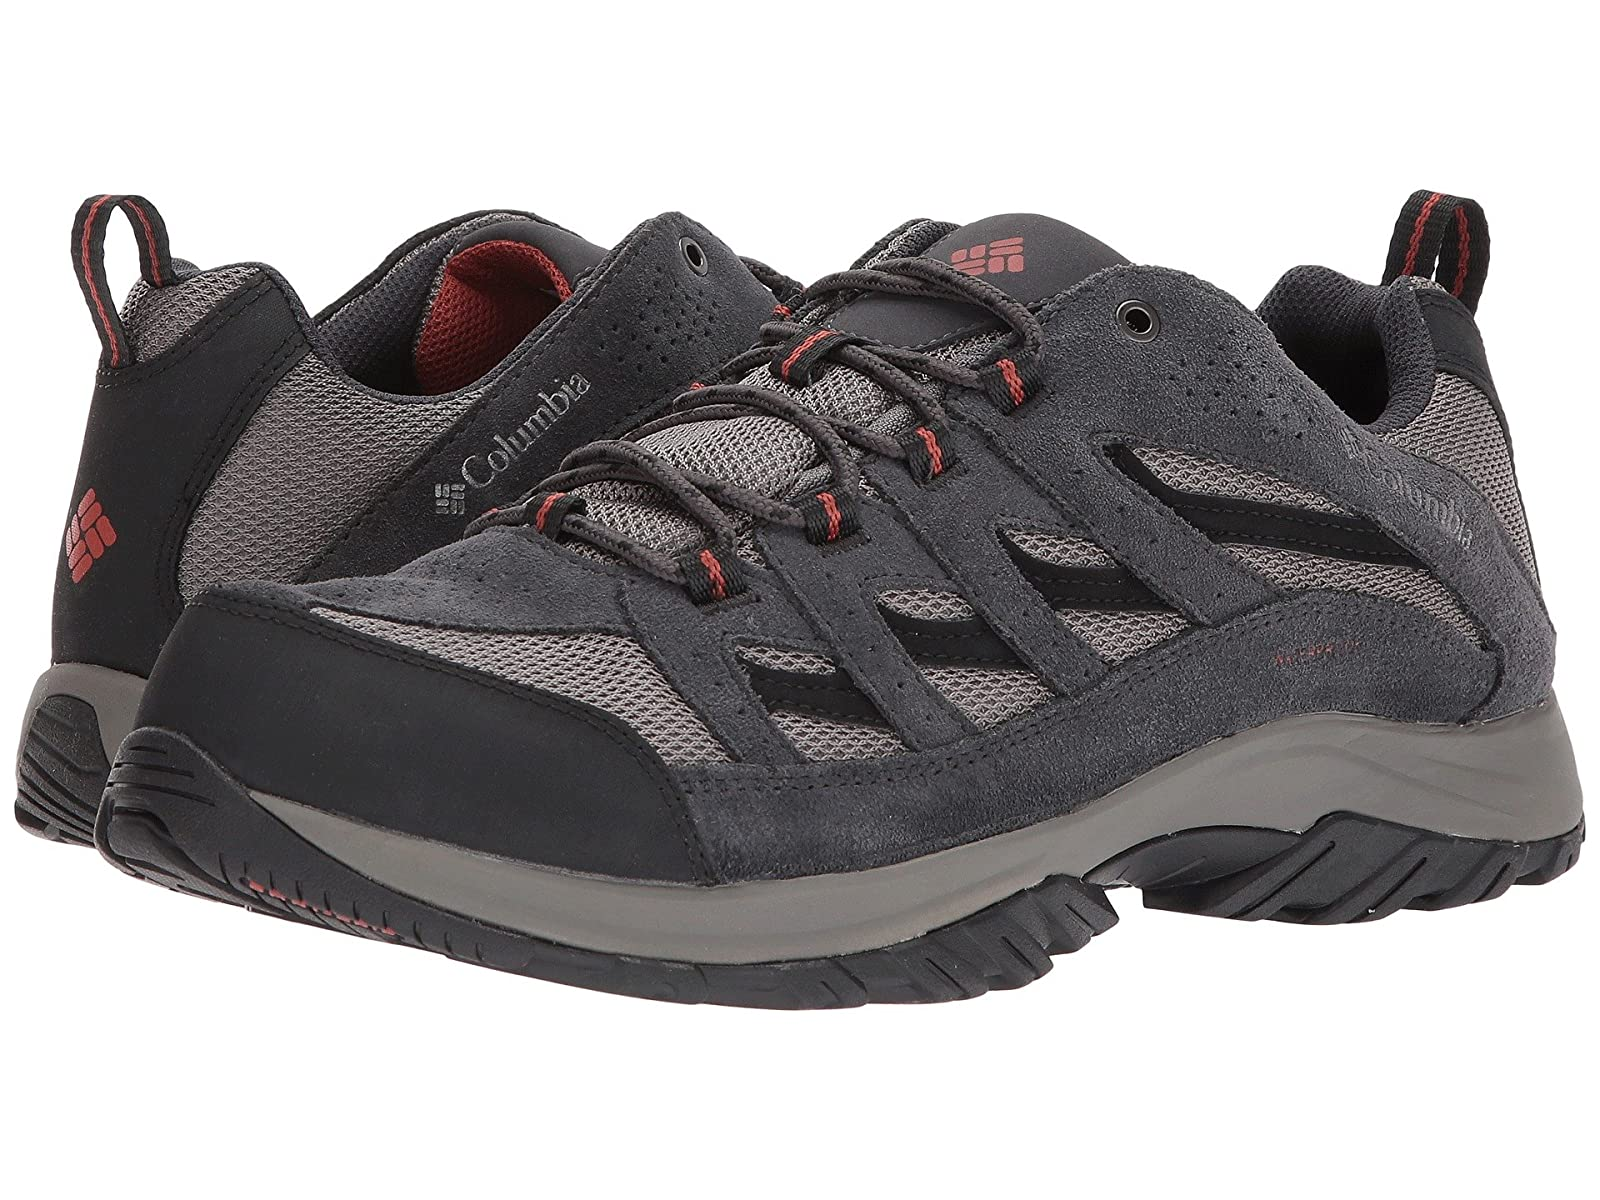 Columbia Crestwood WaterproofAtmospheric grades have affordable shoes